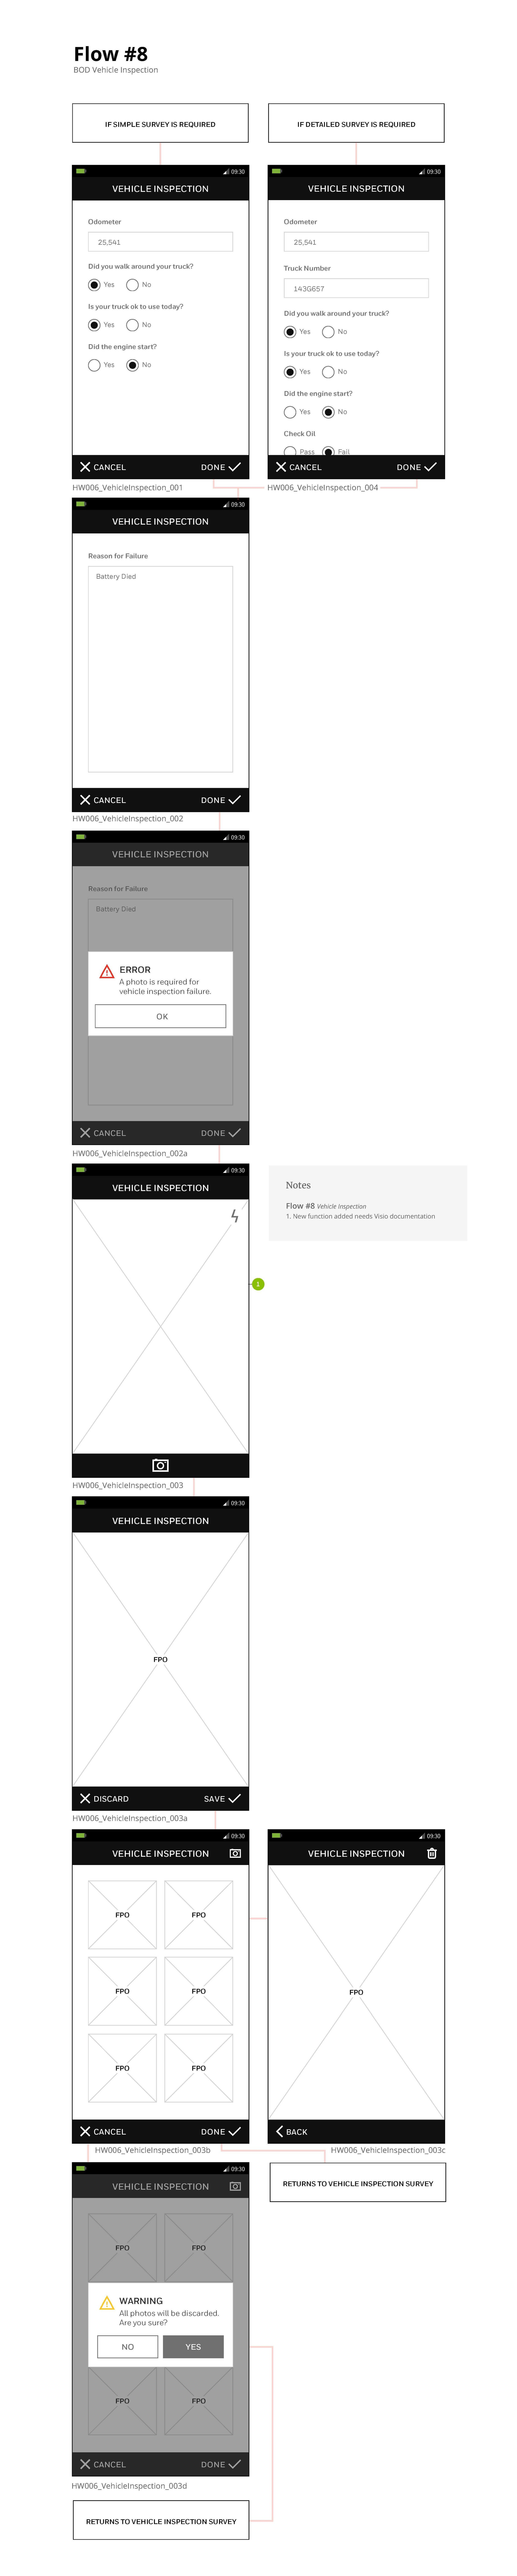 HW006_BODScreens_R1V7_093016_Page_10.jpg